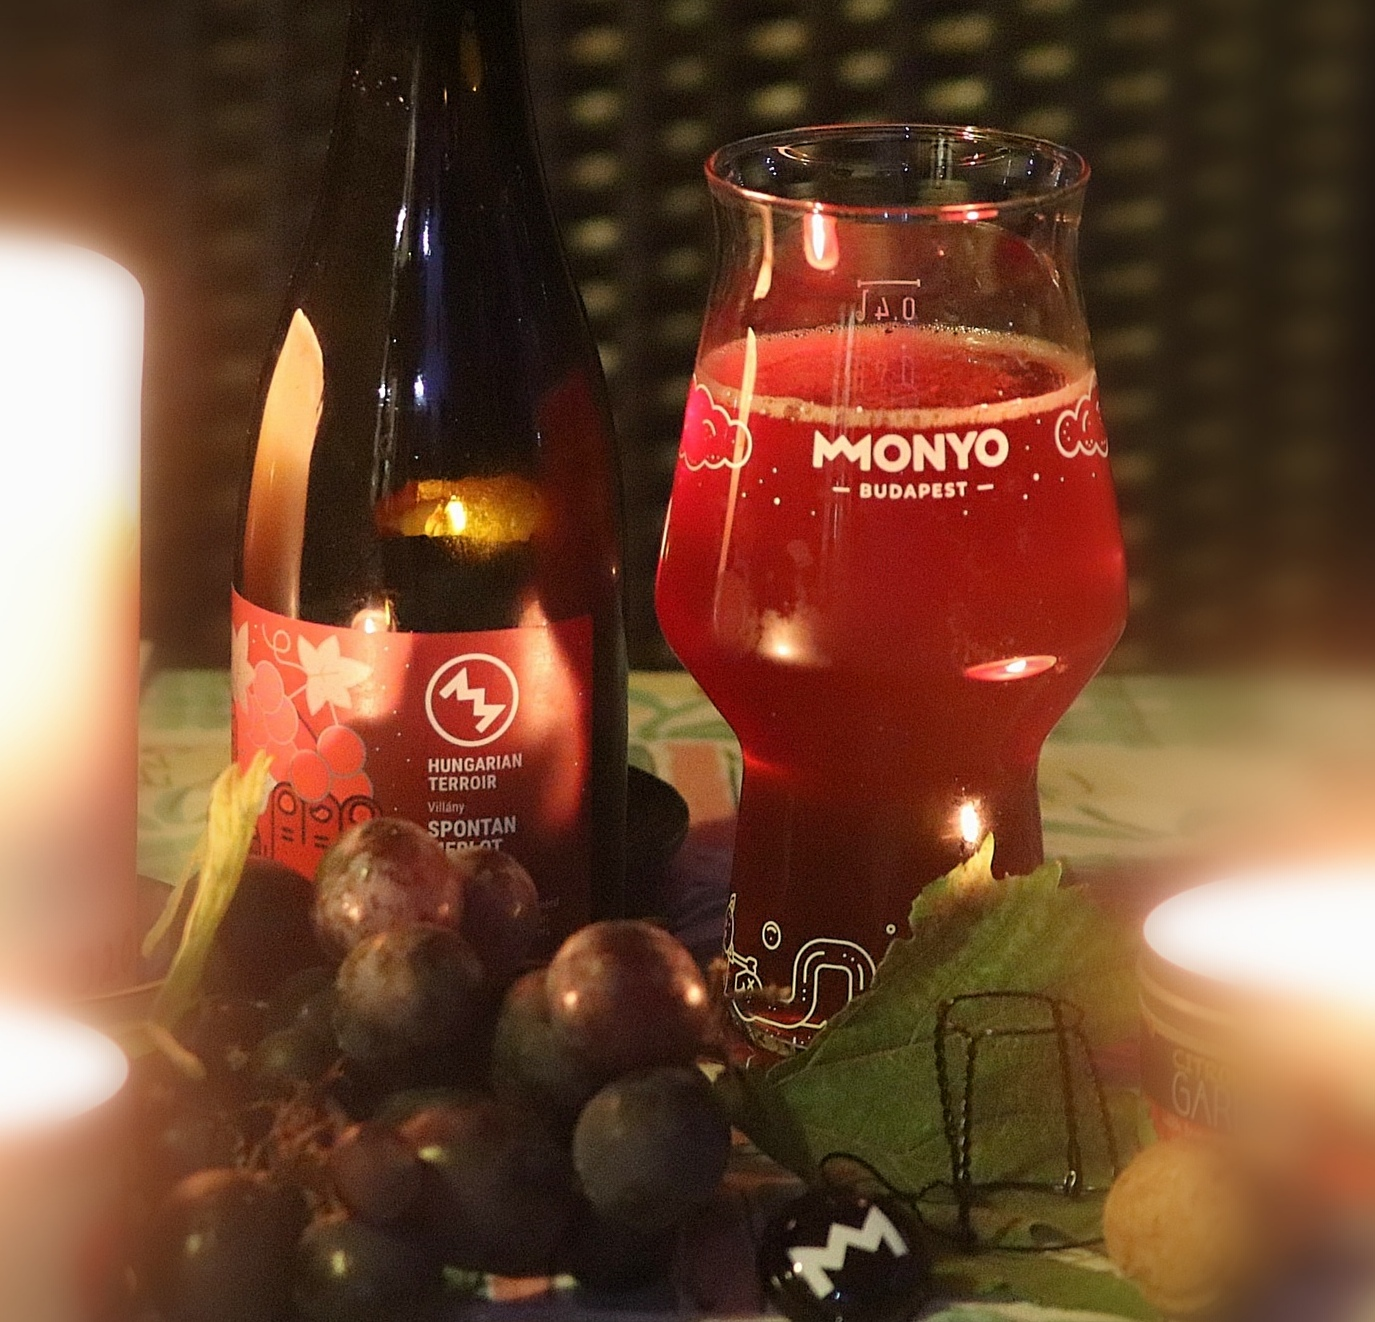 Monyo Hungarian Terroir - Spontan Merlot 2018